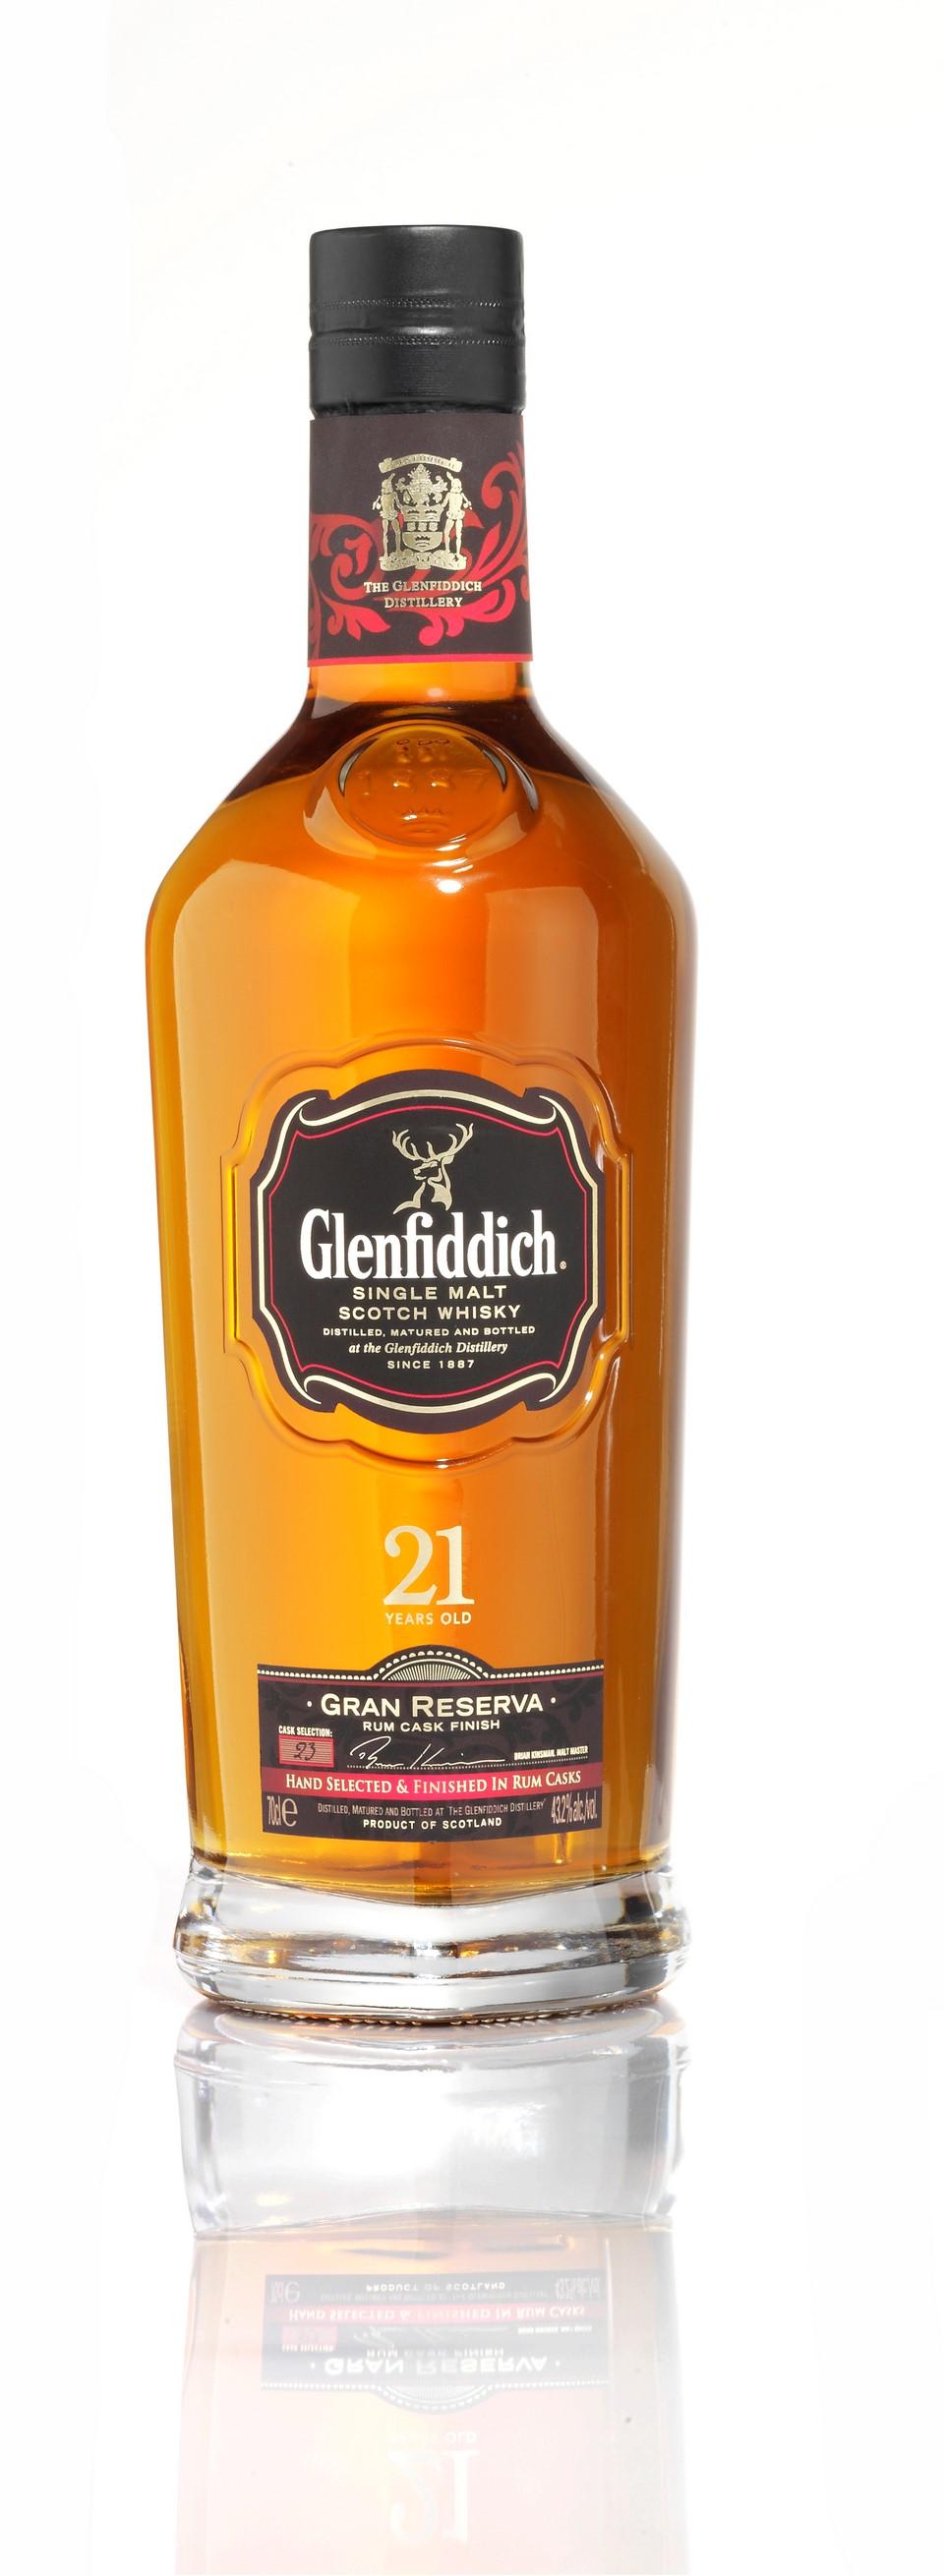 Glenfiddich 21 ans bouteille